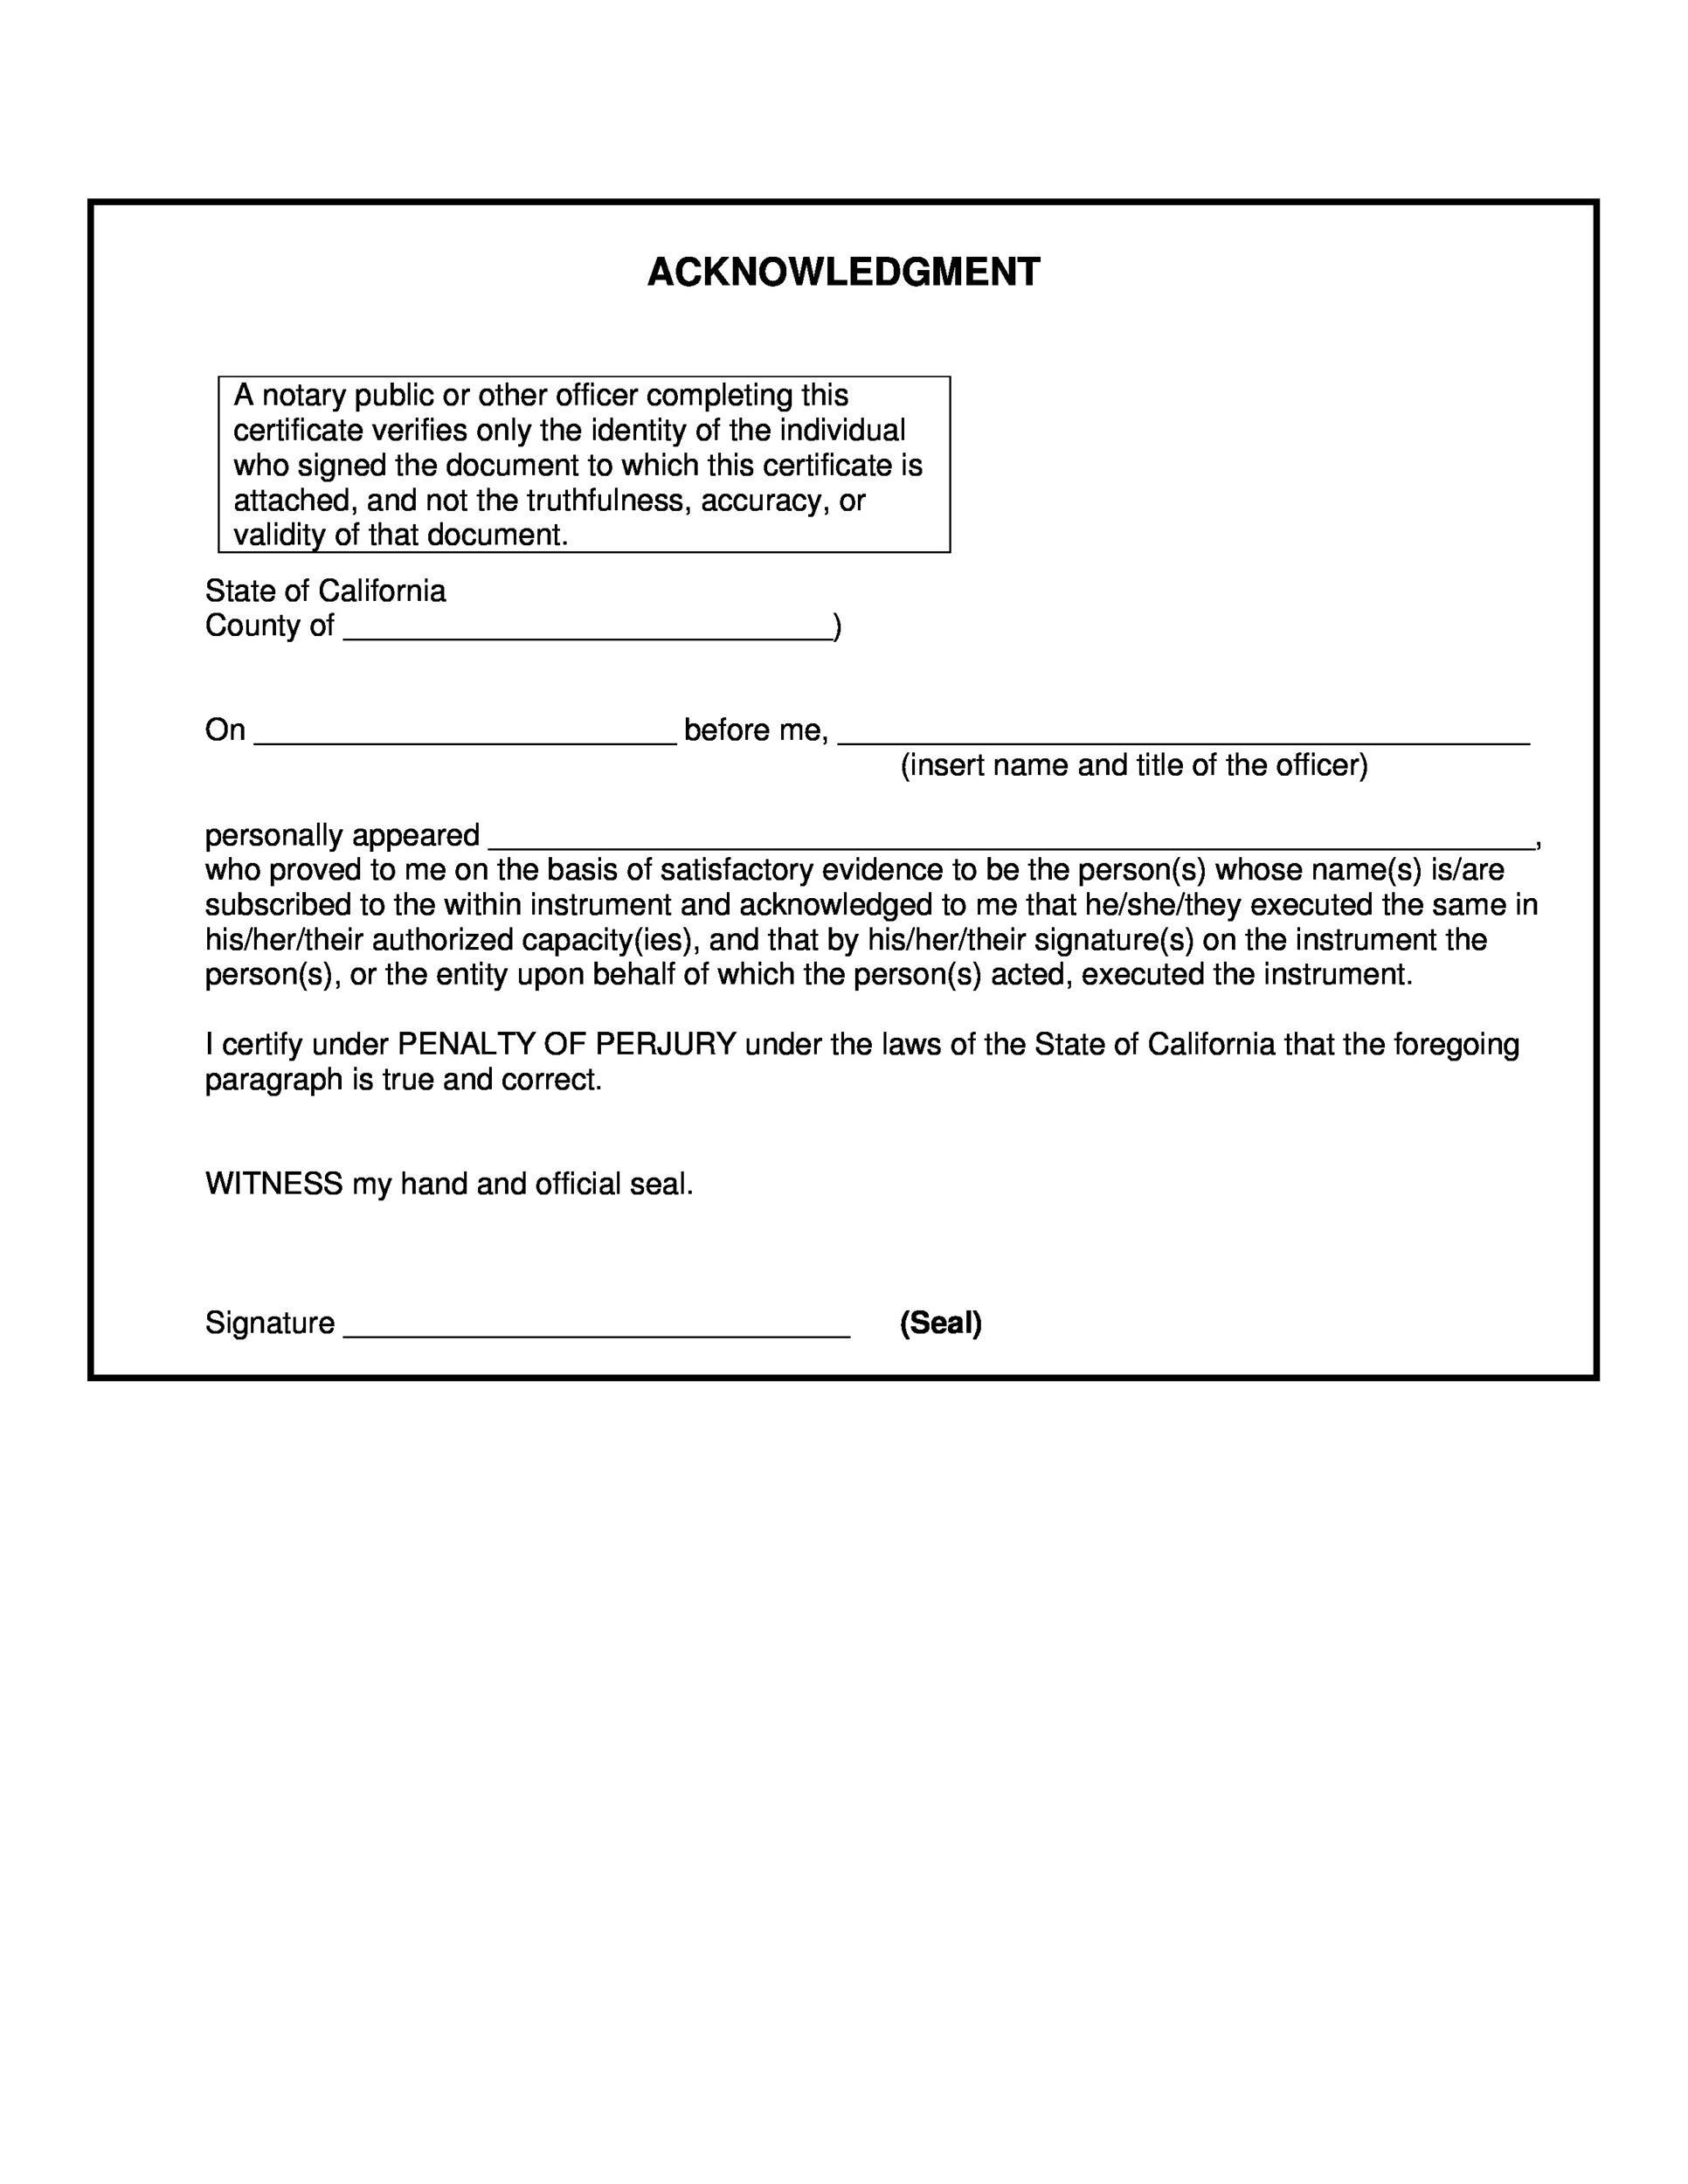 Free acknowledgement sample 41